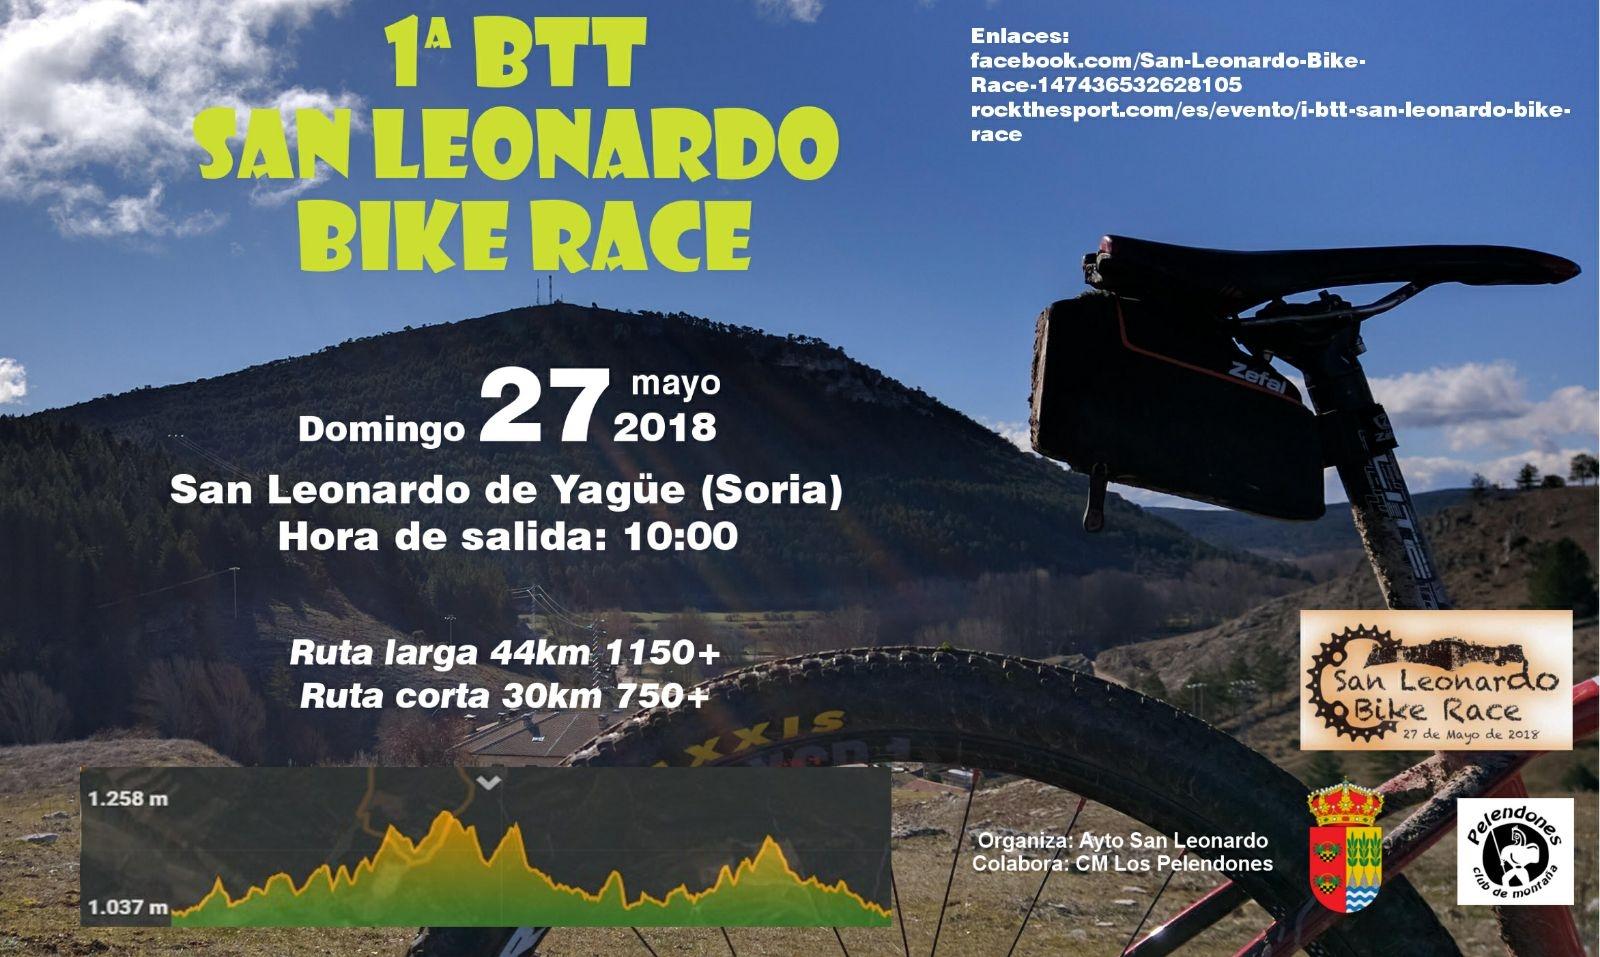 I BTT San Leonardo Bike Race